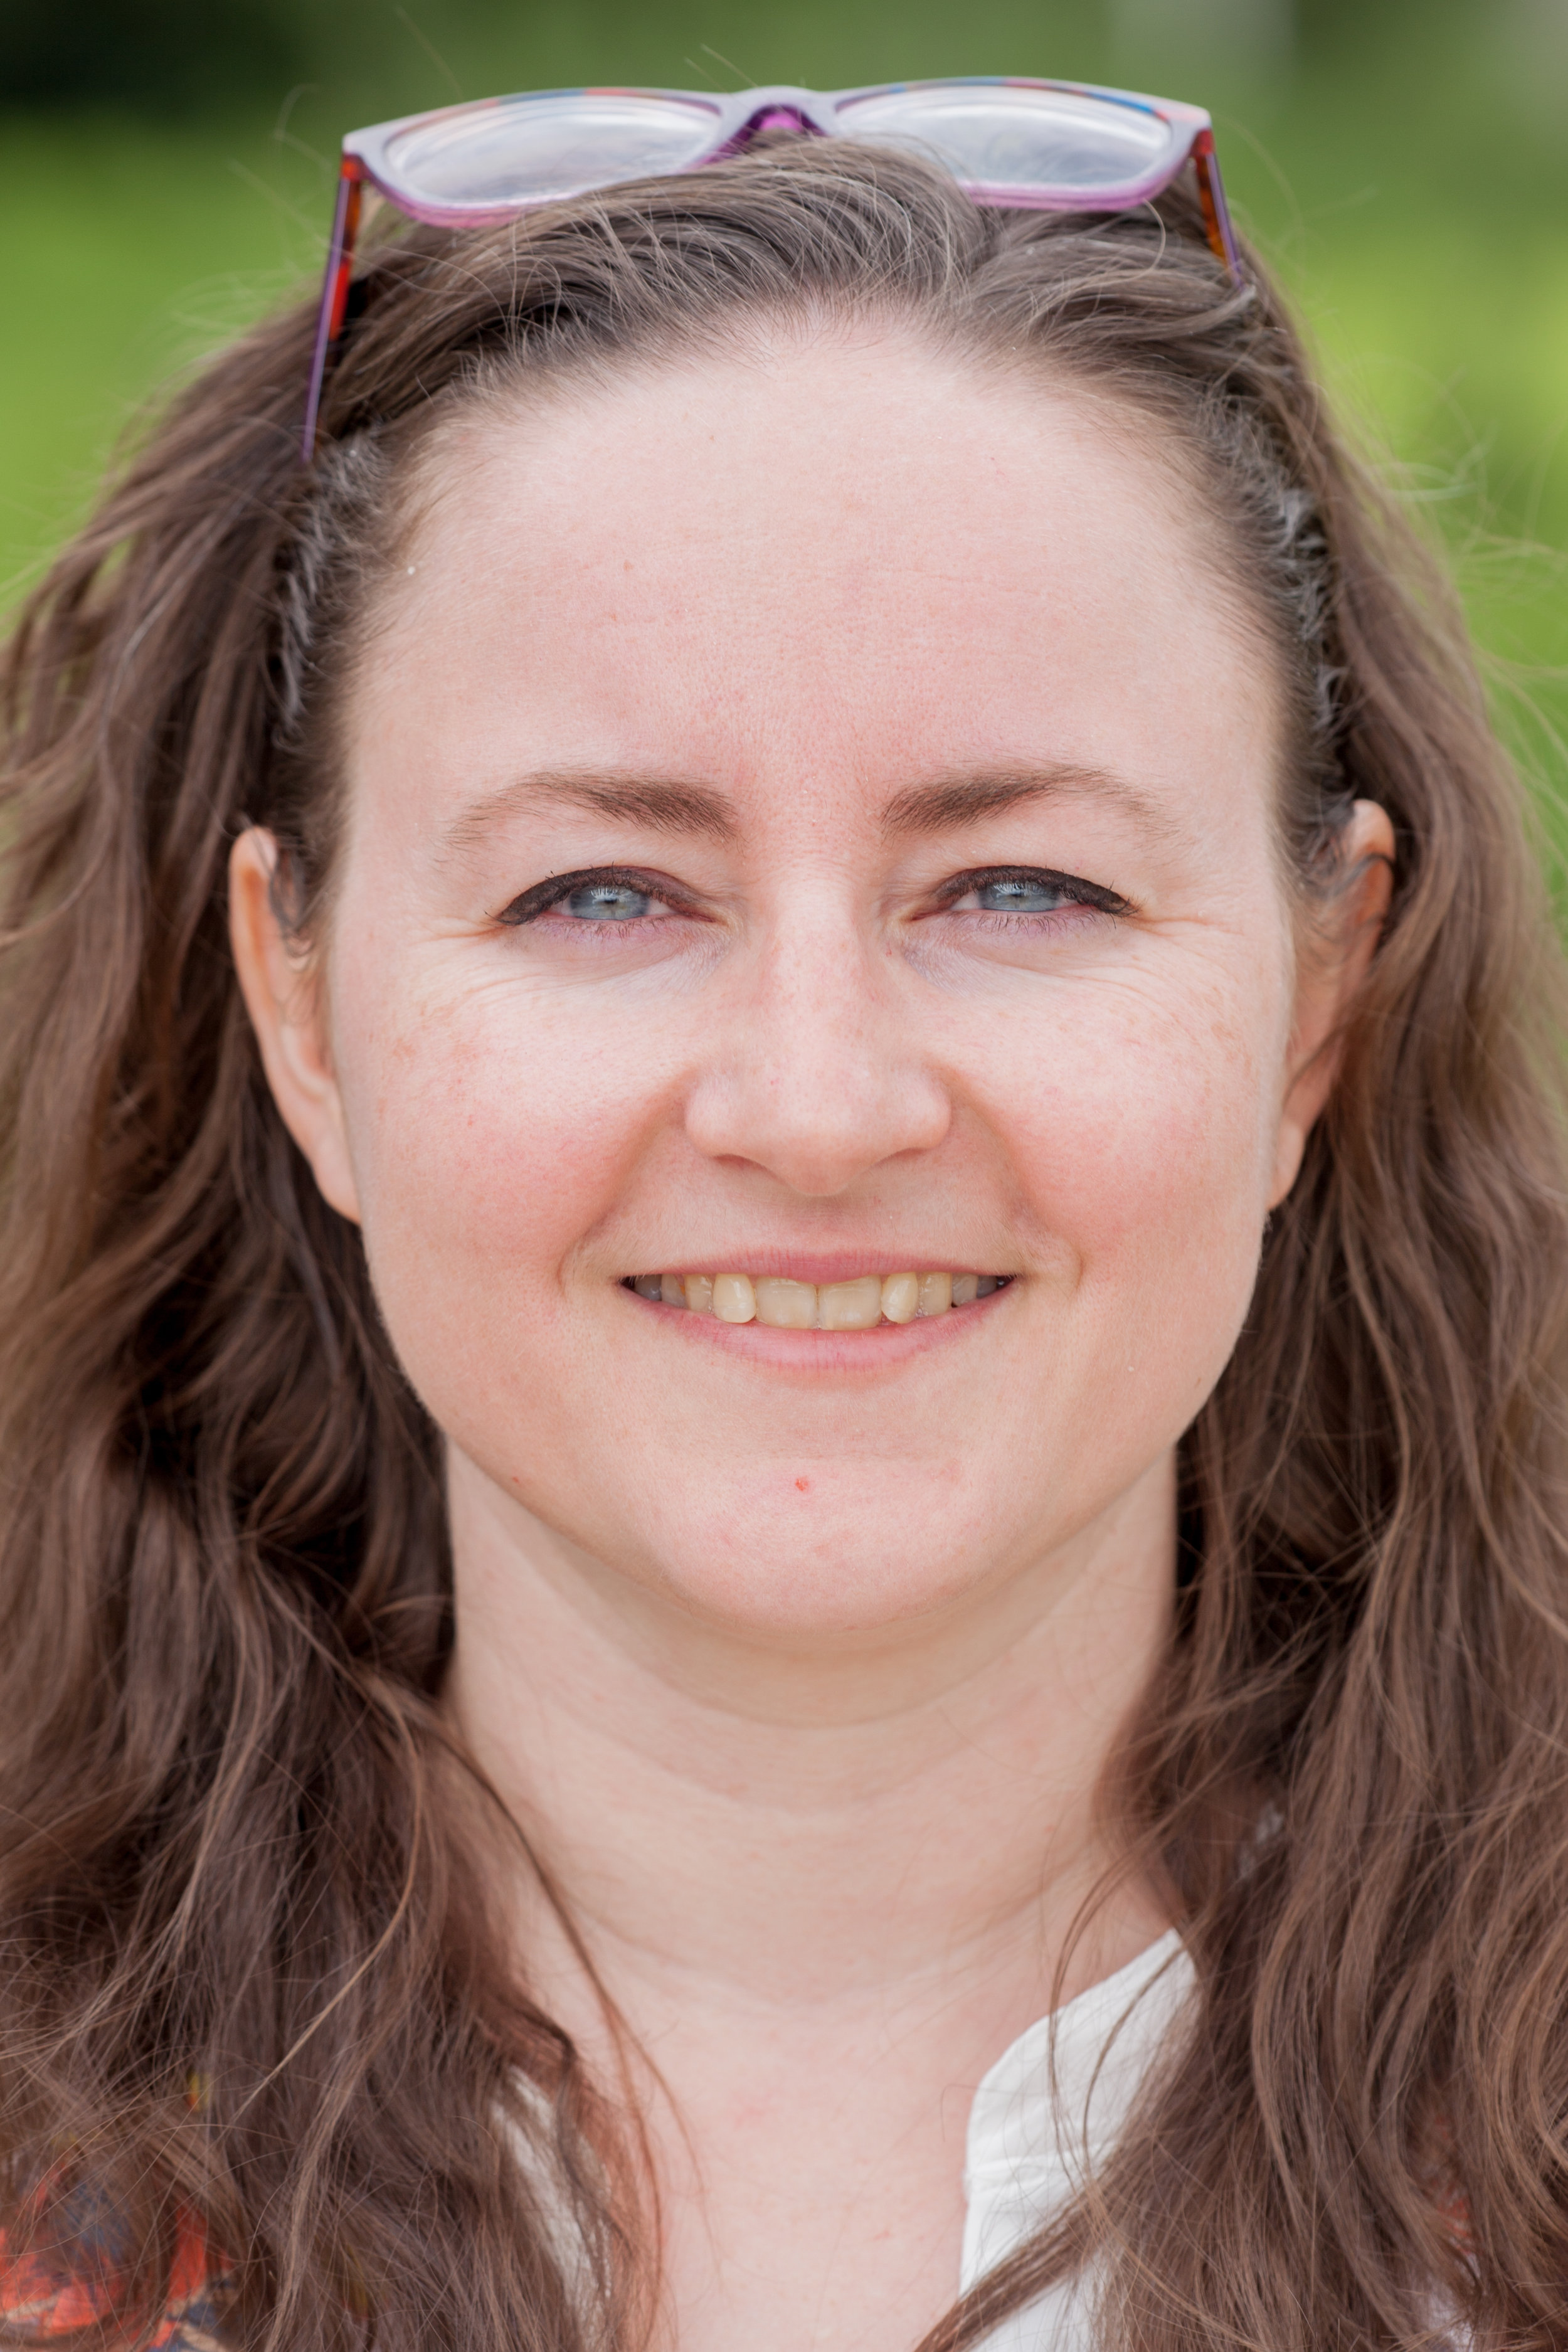 Iliana Bista - Postdoctoral Fellow Wellcome Trust Sanger Institute and Lab Manager (joint with Richard Durbin)PhD 2016 Bangor Universityib8@sanger.ac.uk@ilianailiana3